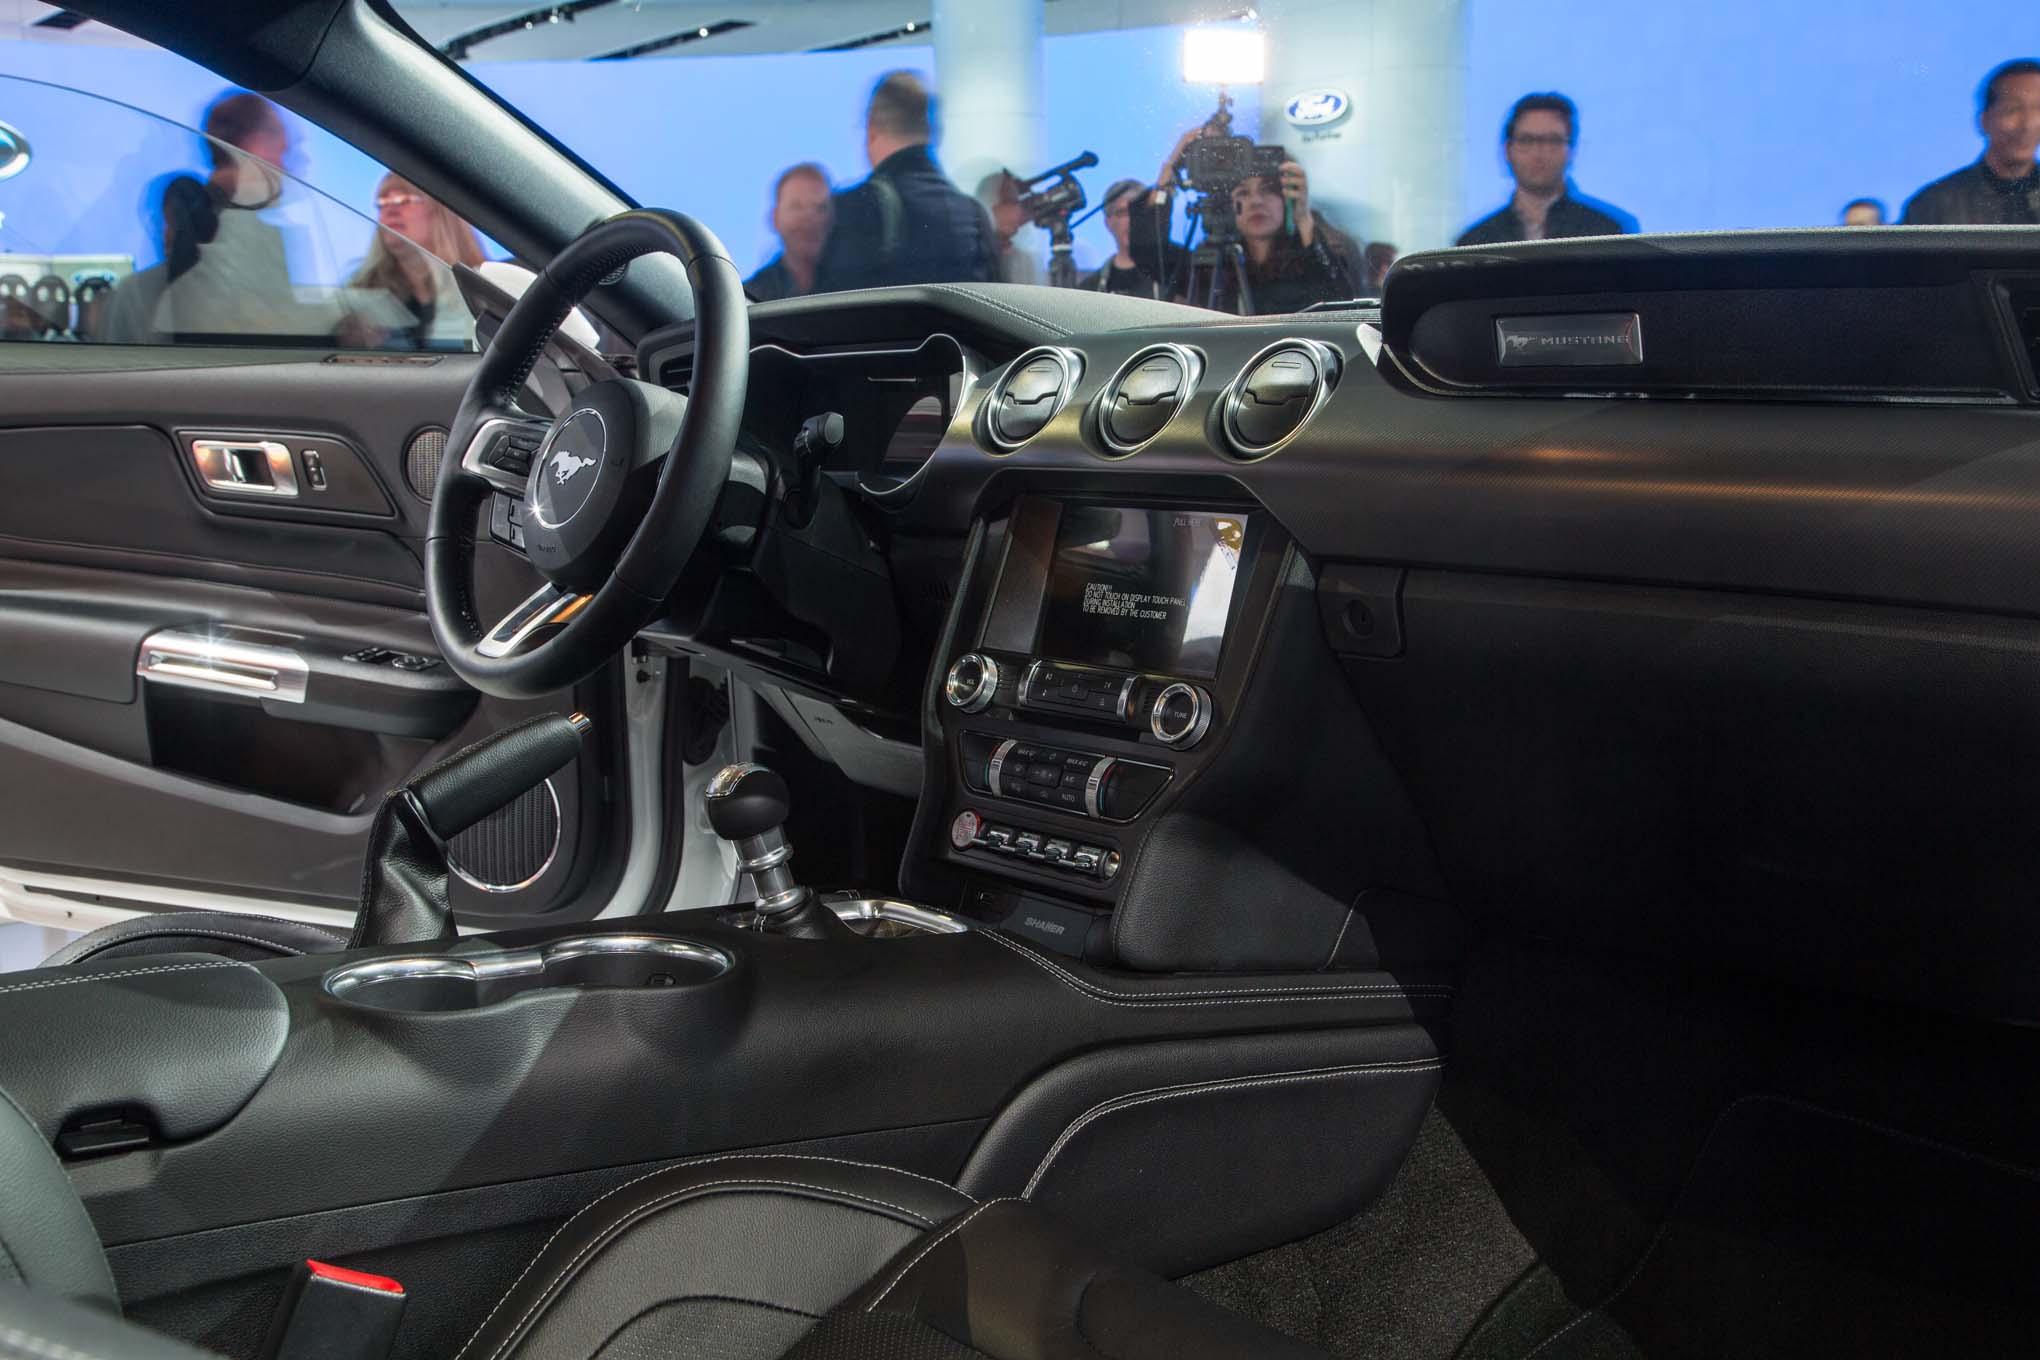 2018 ford fusion coupe interior. show more 2018 ford fusion coupe interior